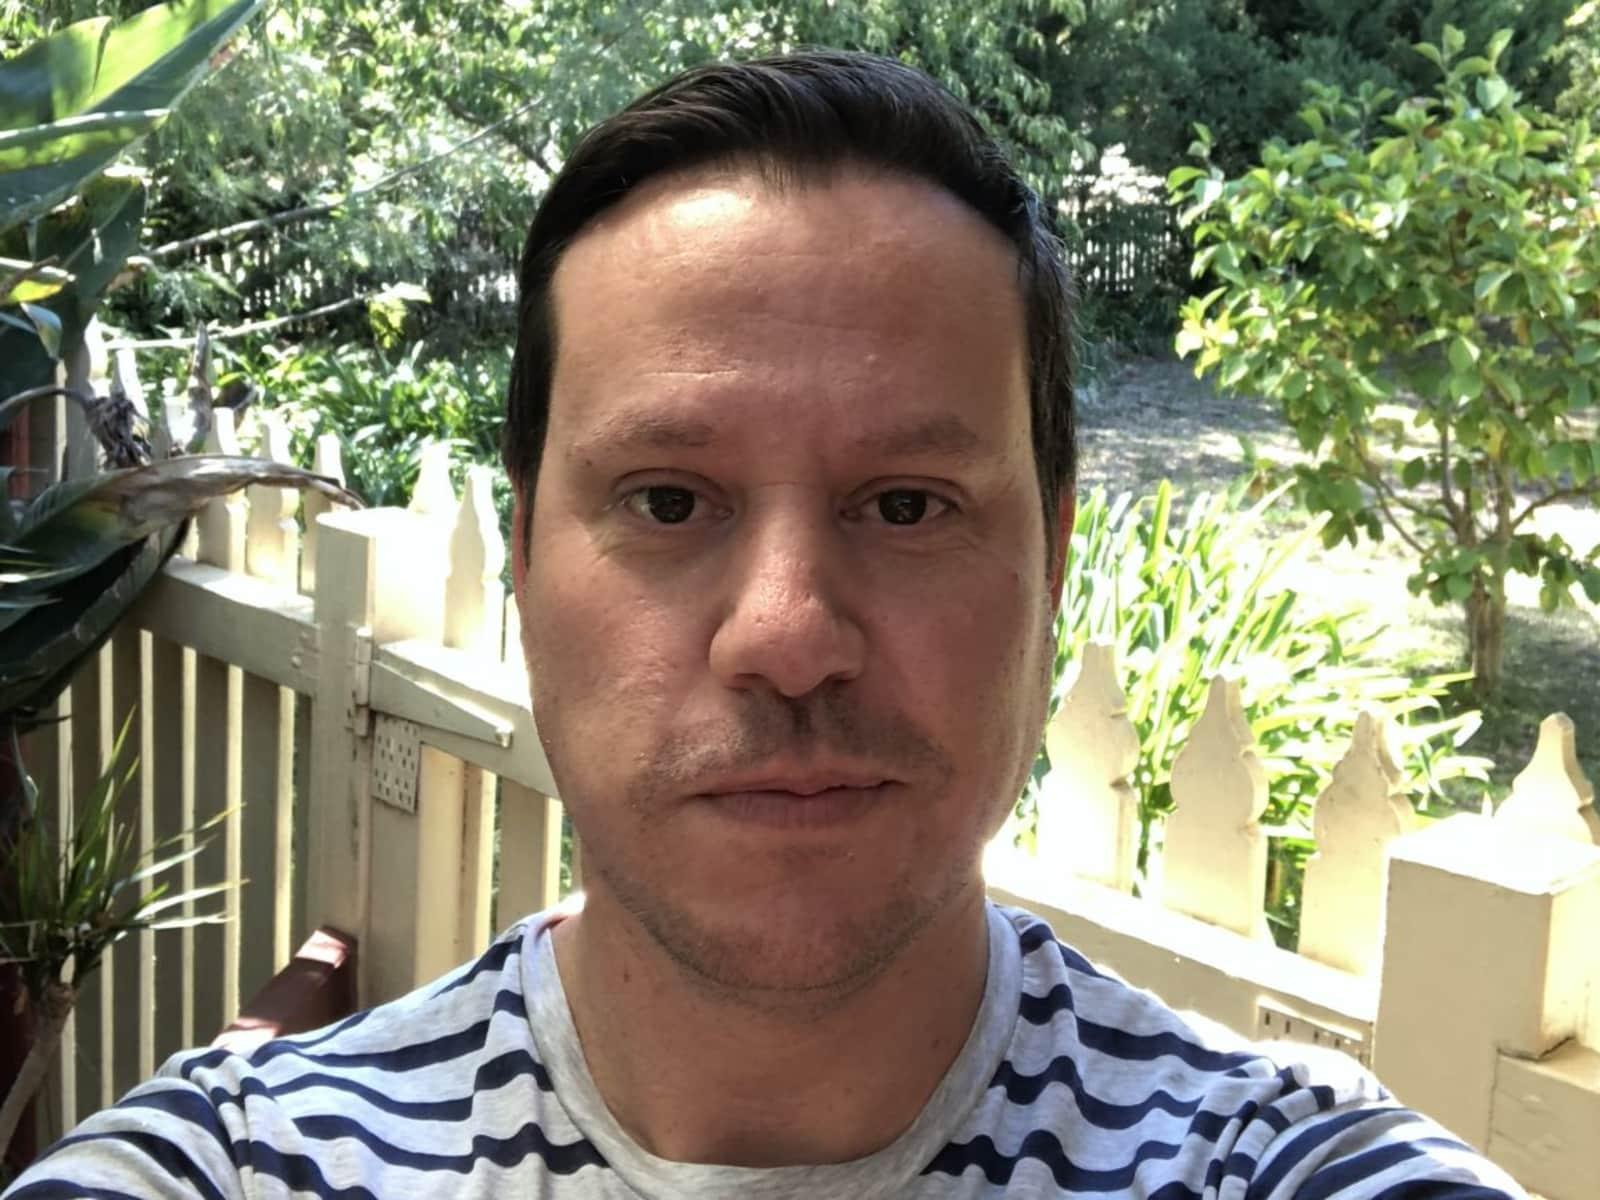 Steve from Melbourne, Victoria, Australia